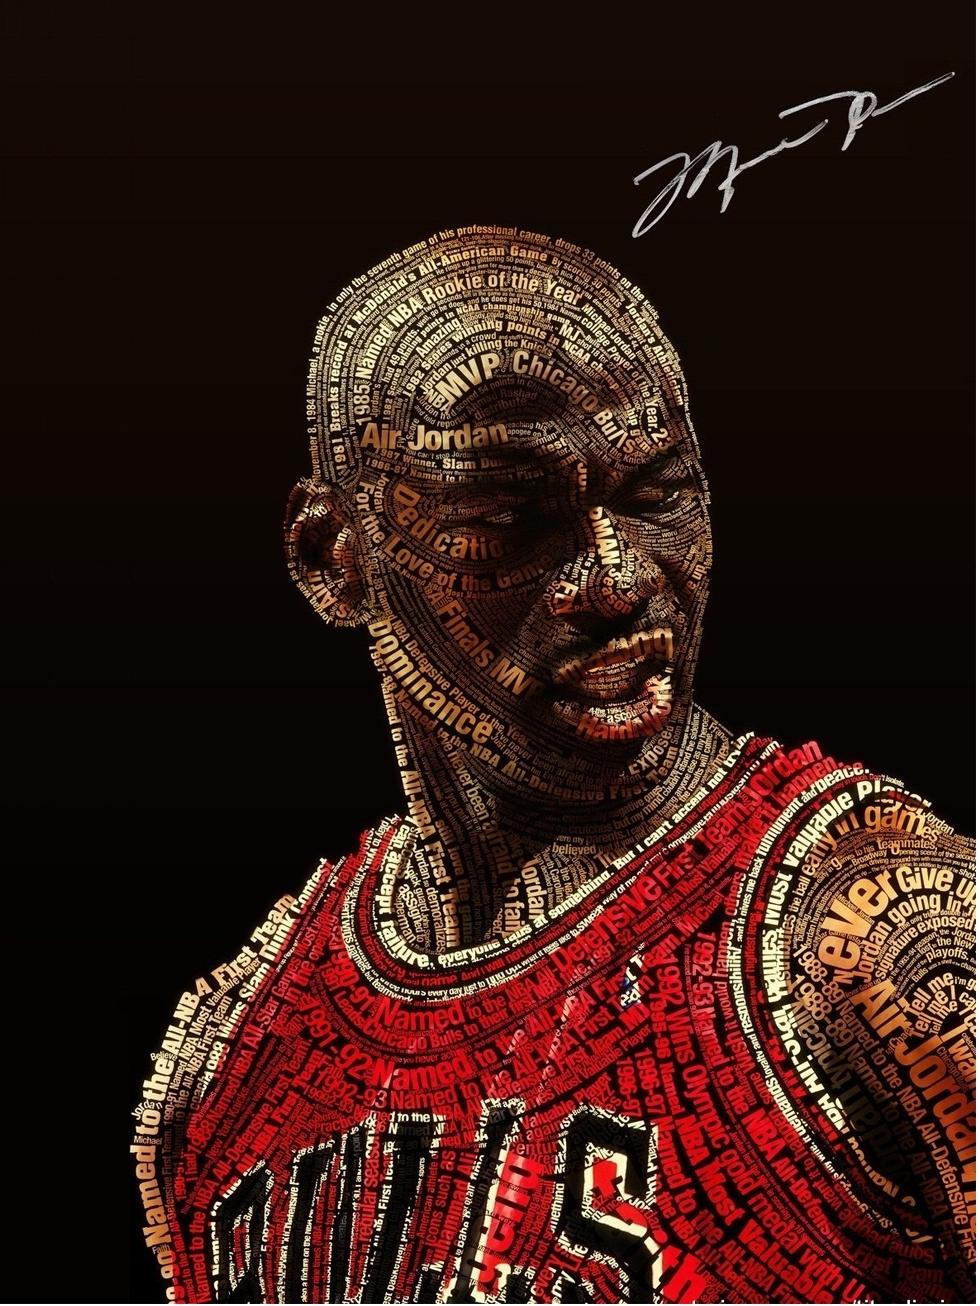 2017 Free Shipping Nba Michael Jordan Poster Home Decor Painting Inside Most Popular Michael Jordan Canvas Wall Art (View 8 of 15)